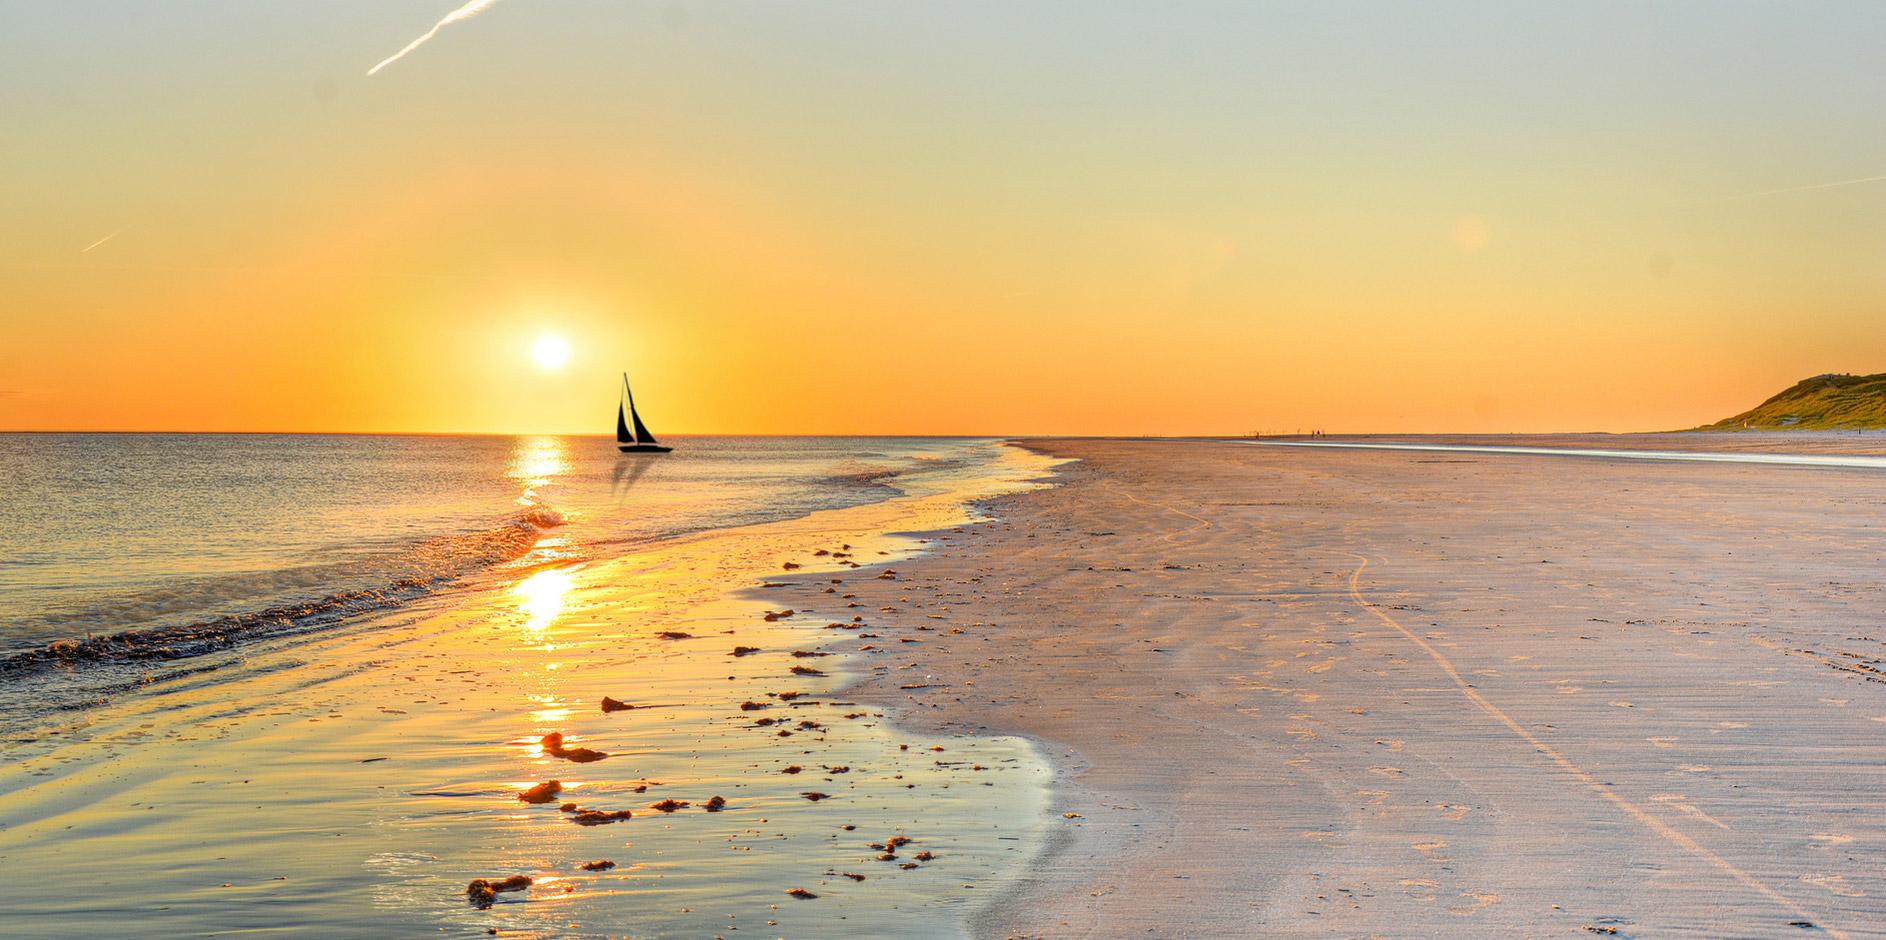 Sonnenuntergang am Usedomer Strand